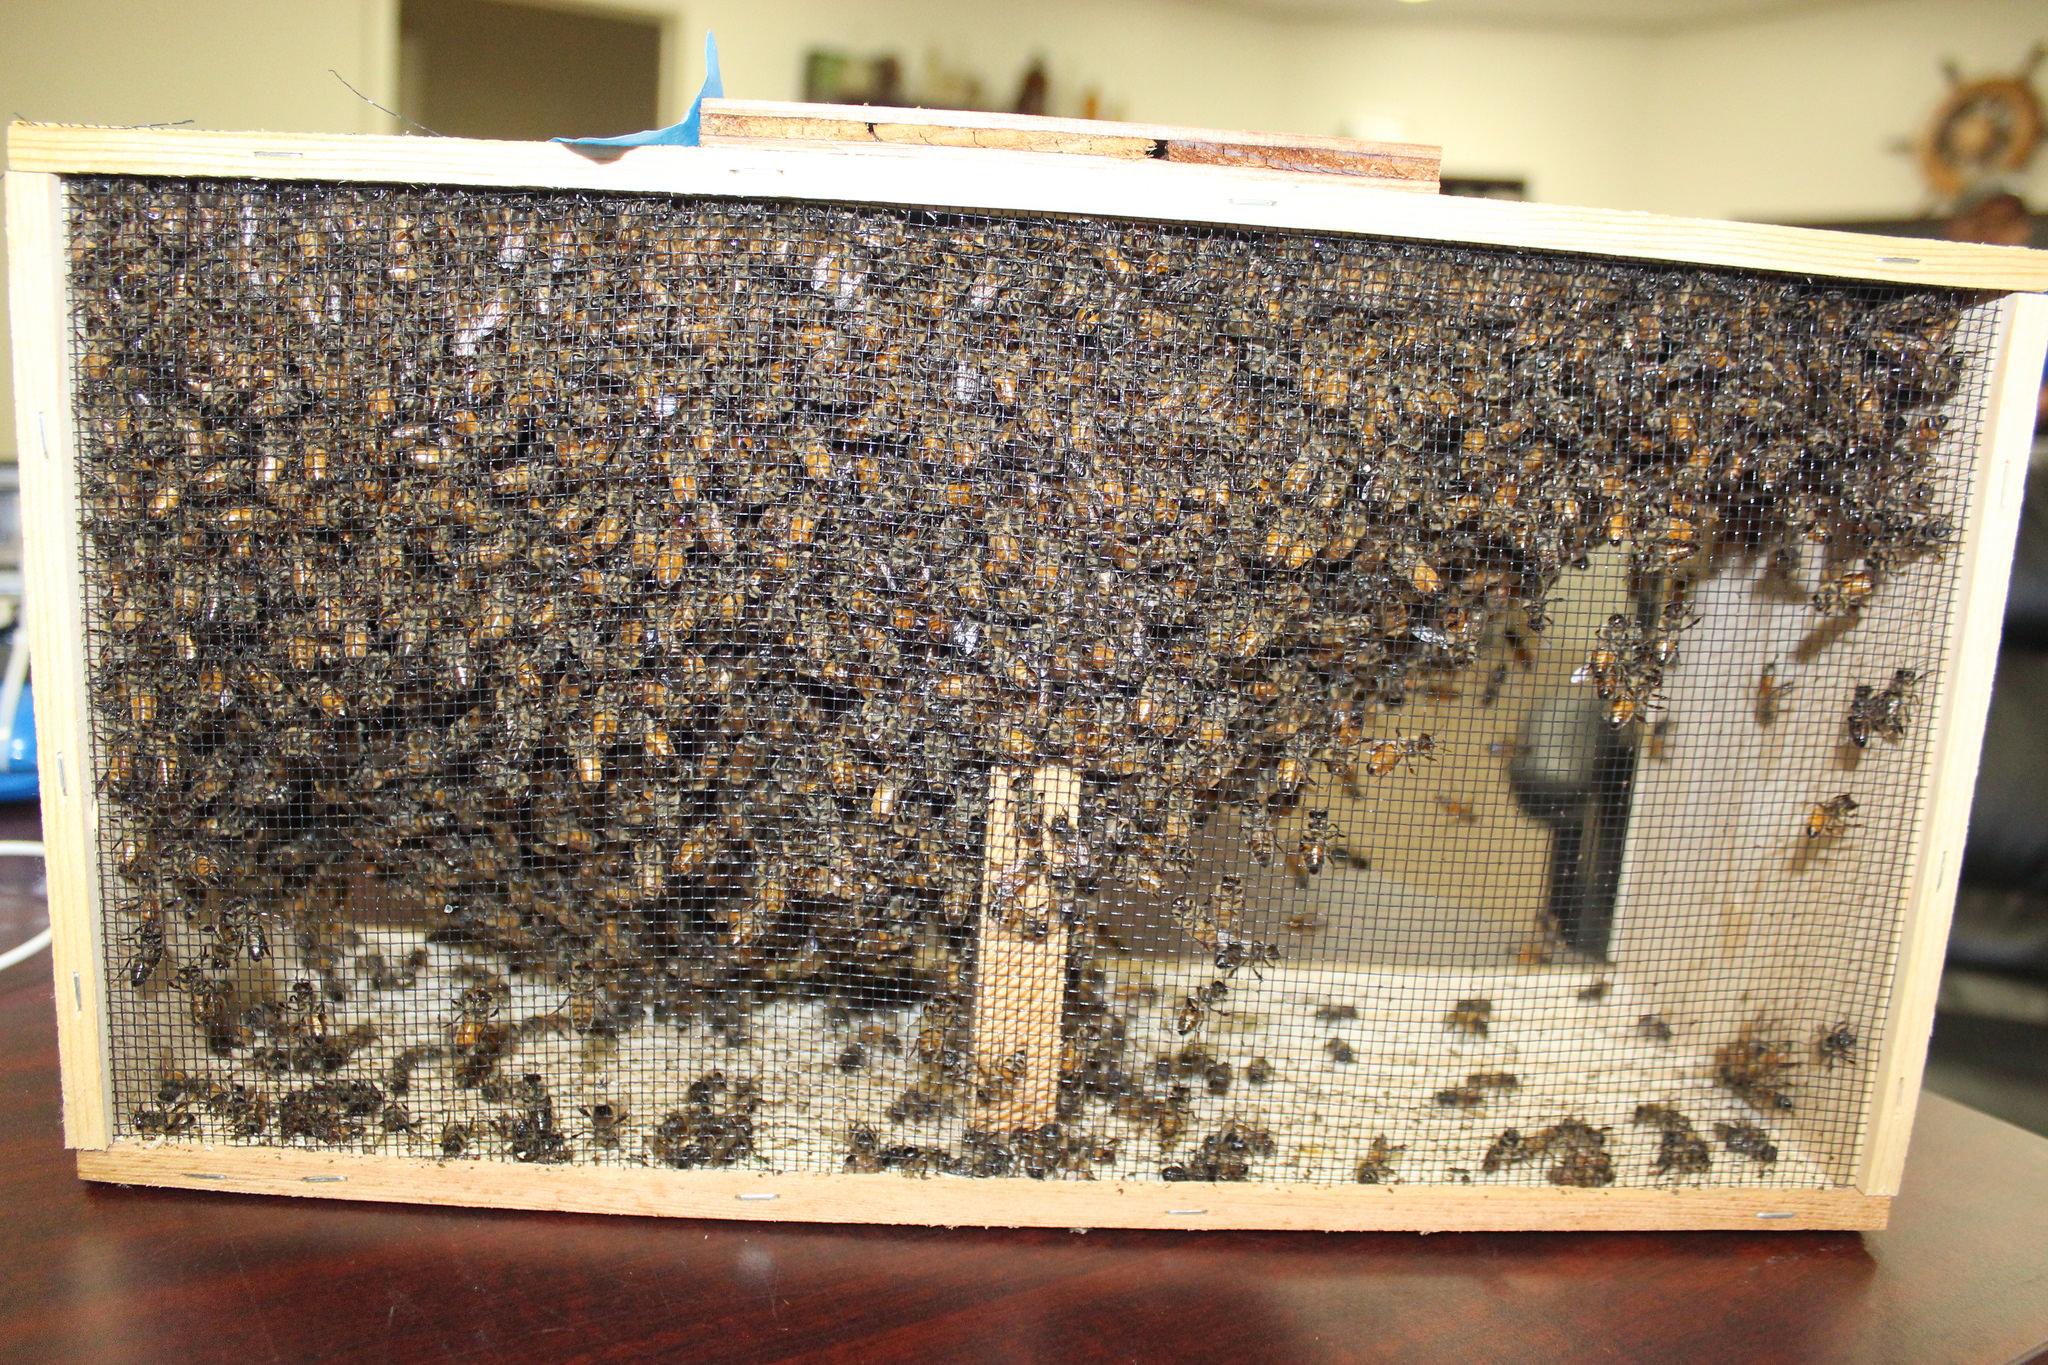 Box of Honeybees